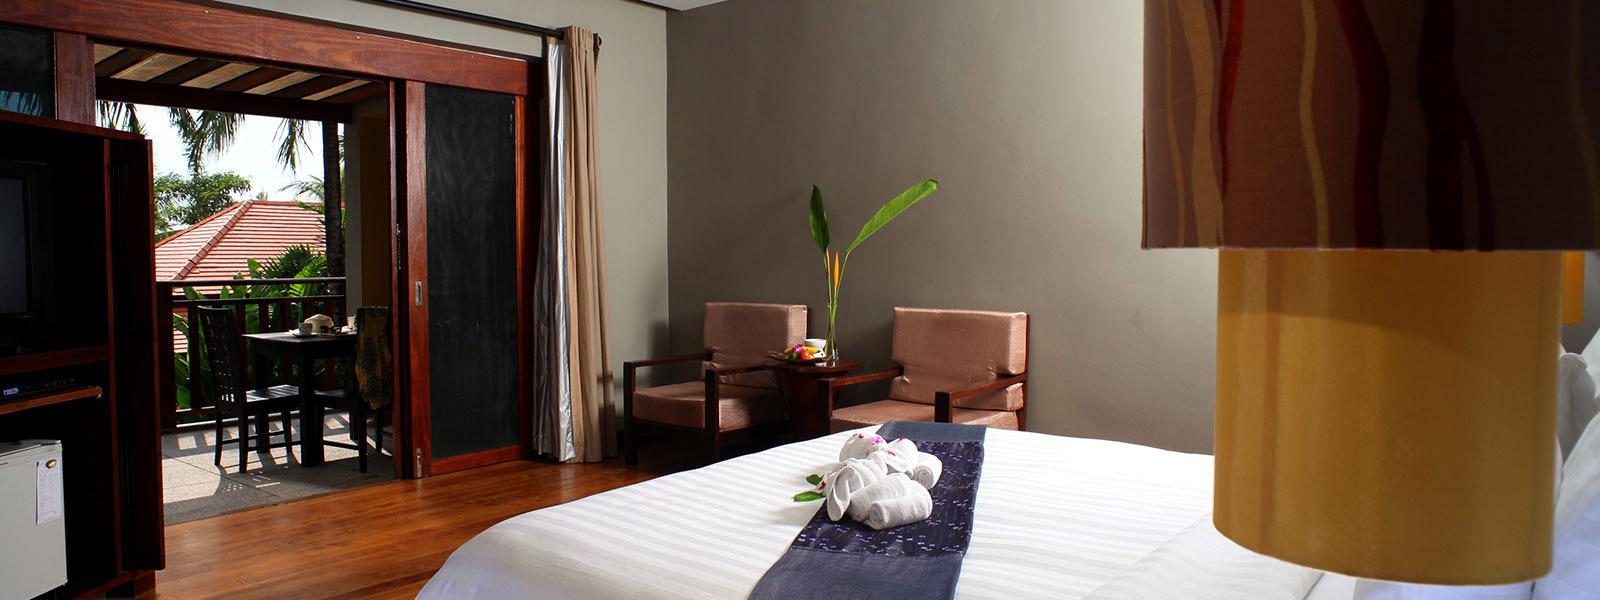 Chongfah Resort Khao Lak - Deluxe Room